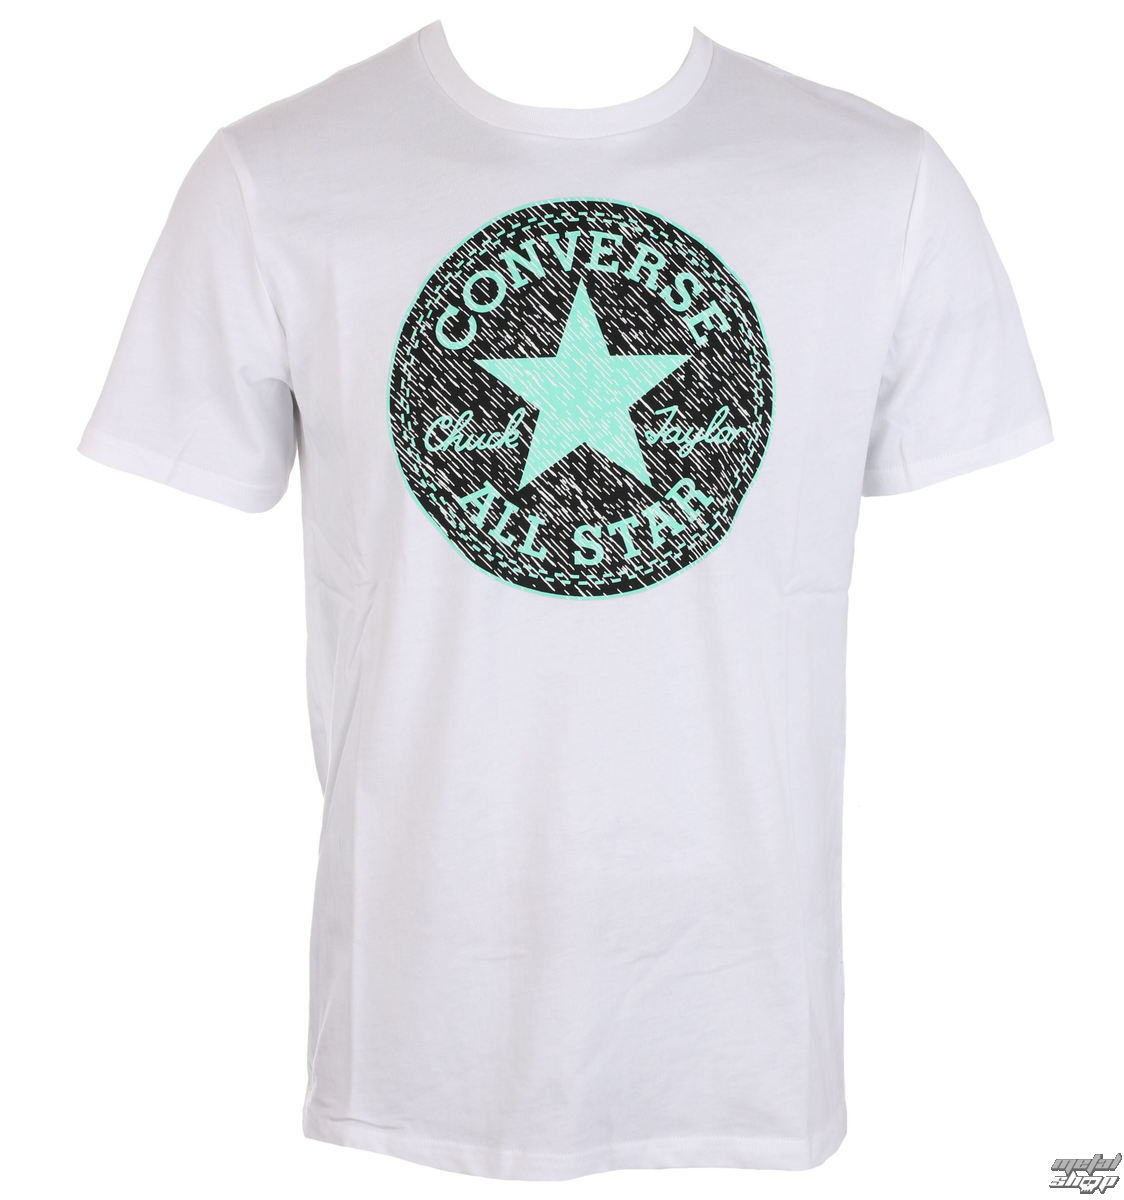 tričko pánské CONVERSE - CP Knit - 10003908-A01 - metal-shop.eu 5a4e16f8152